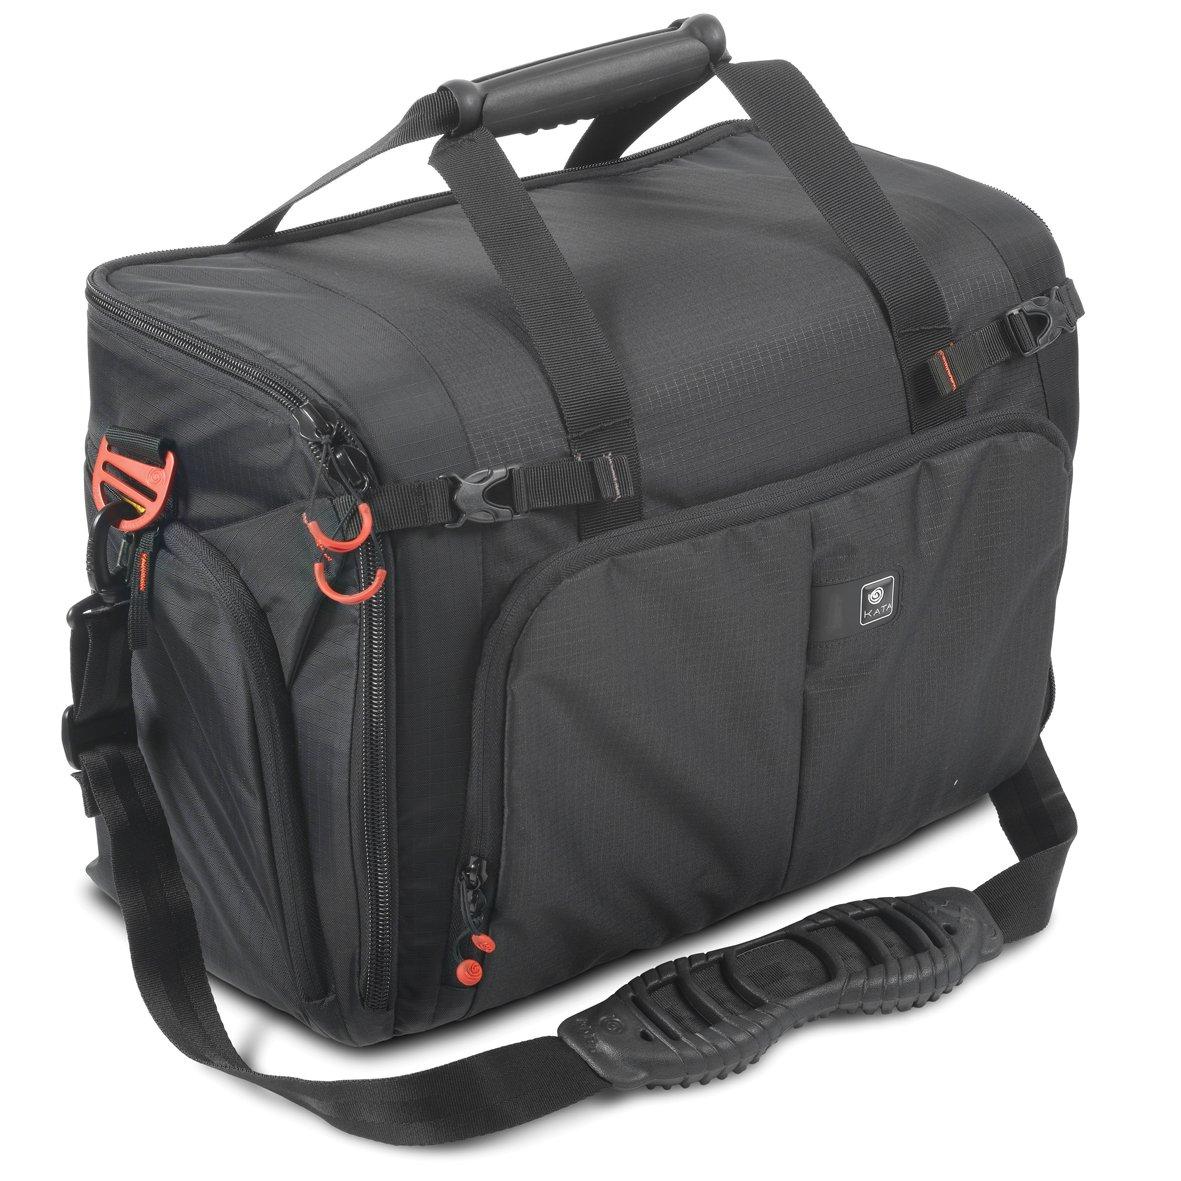 KATA ショルダーバッグ Pro-lightコレクション 25.9L 大容量 レインカバー付属 ブラック KT PL-R-64   B008ET9C94